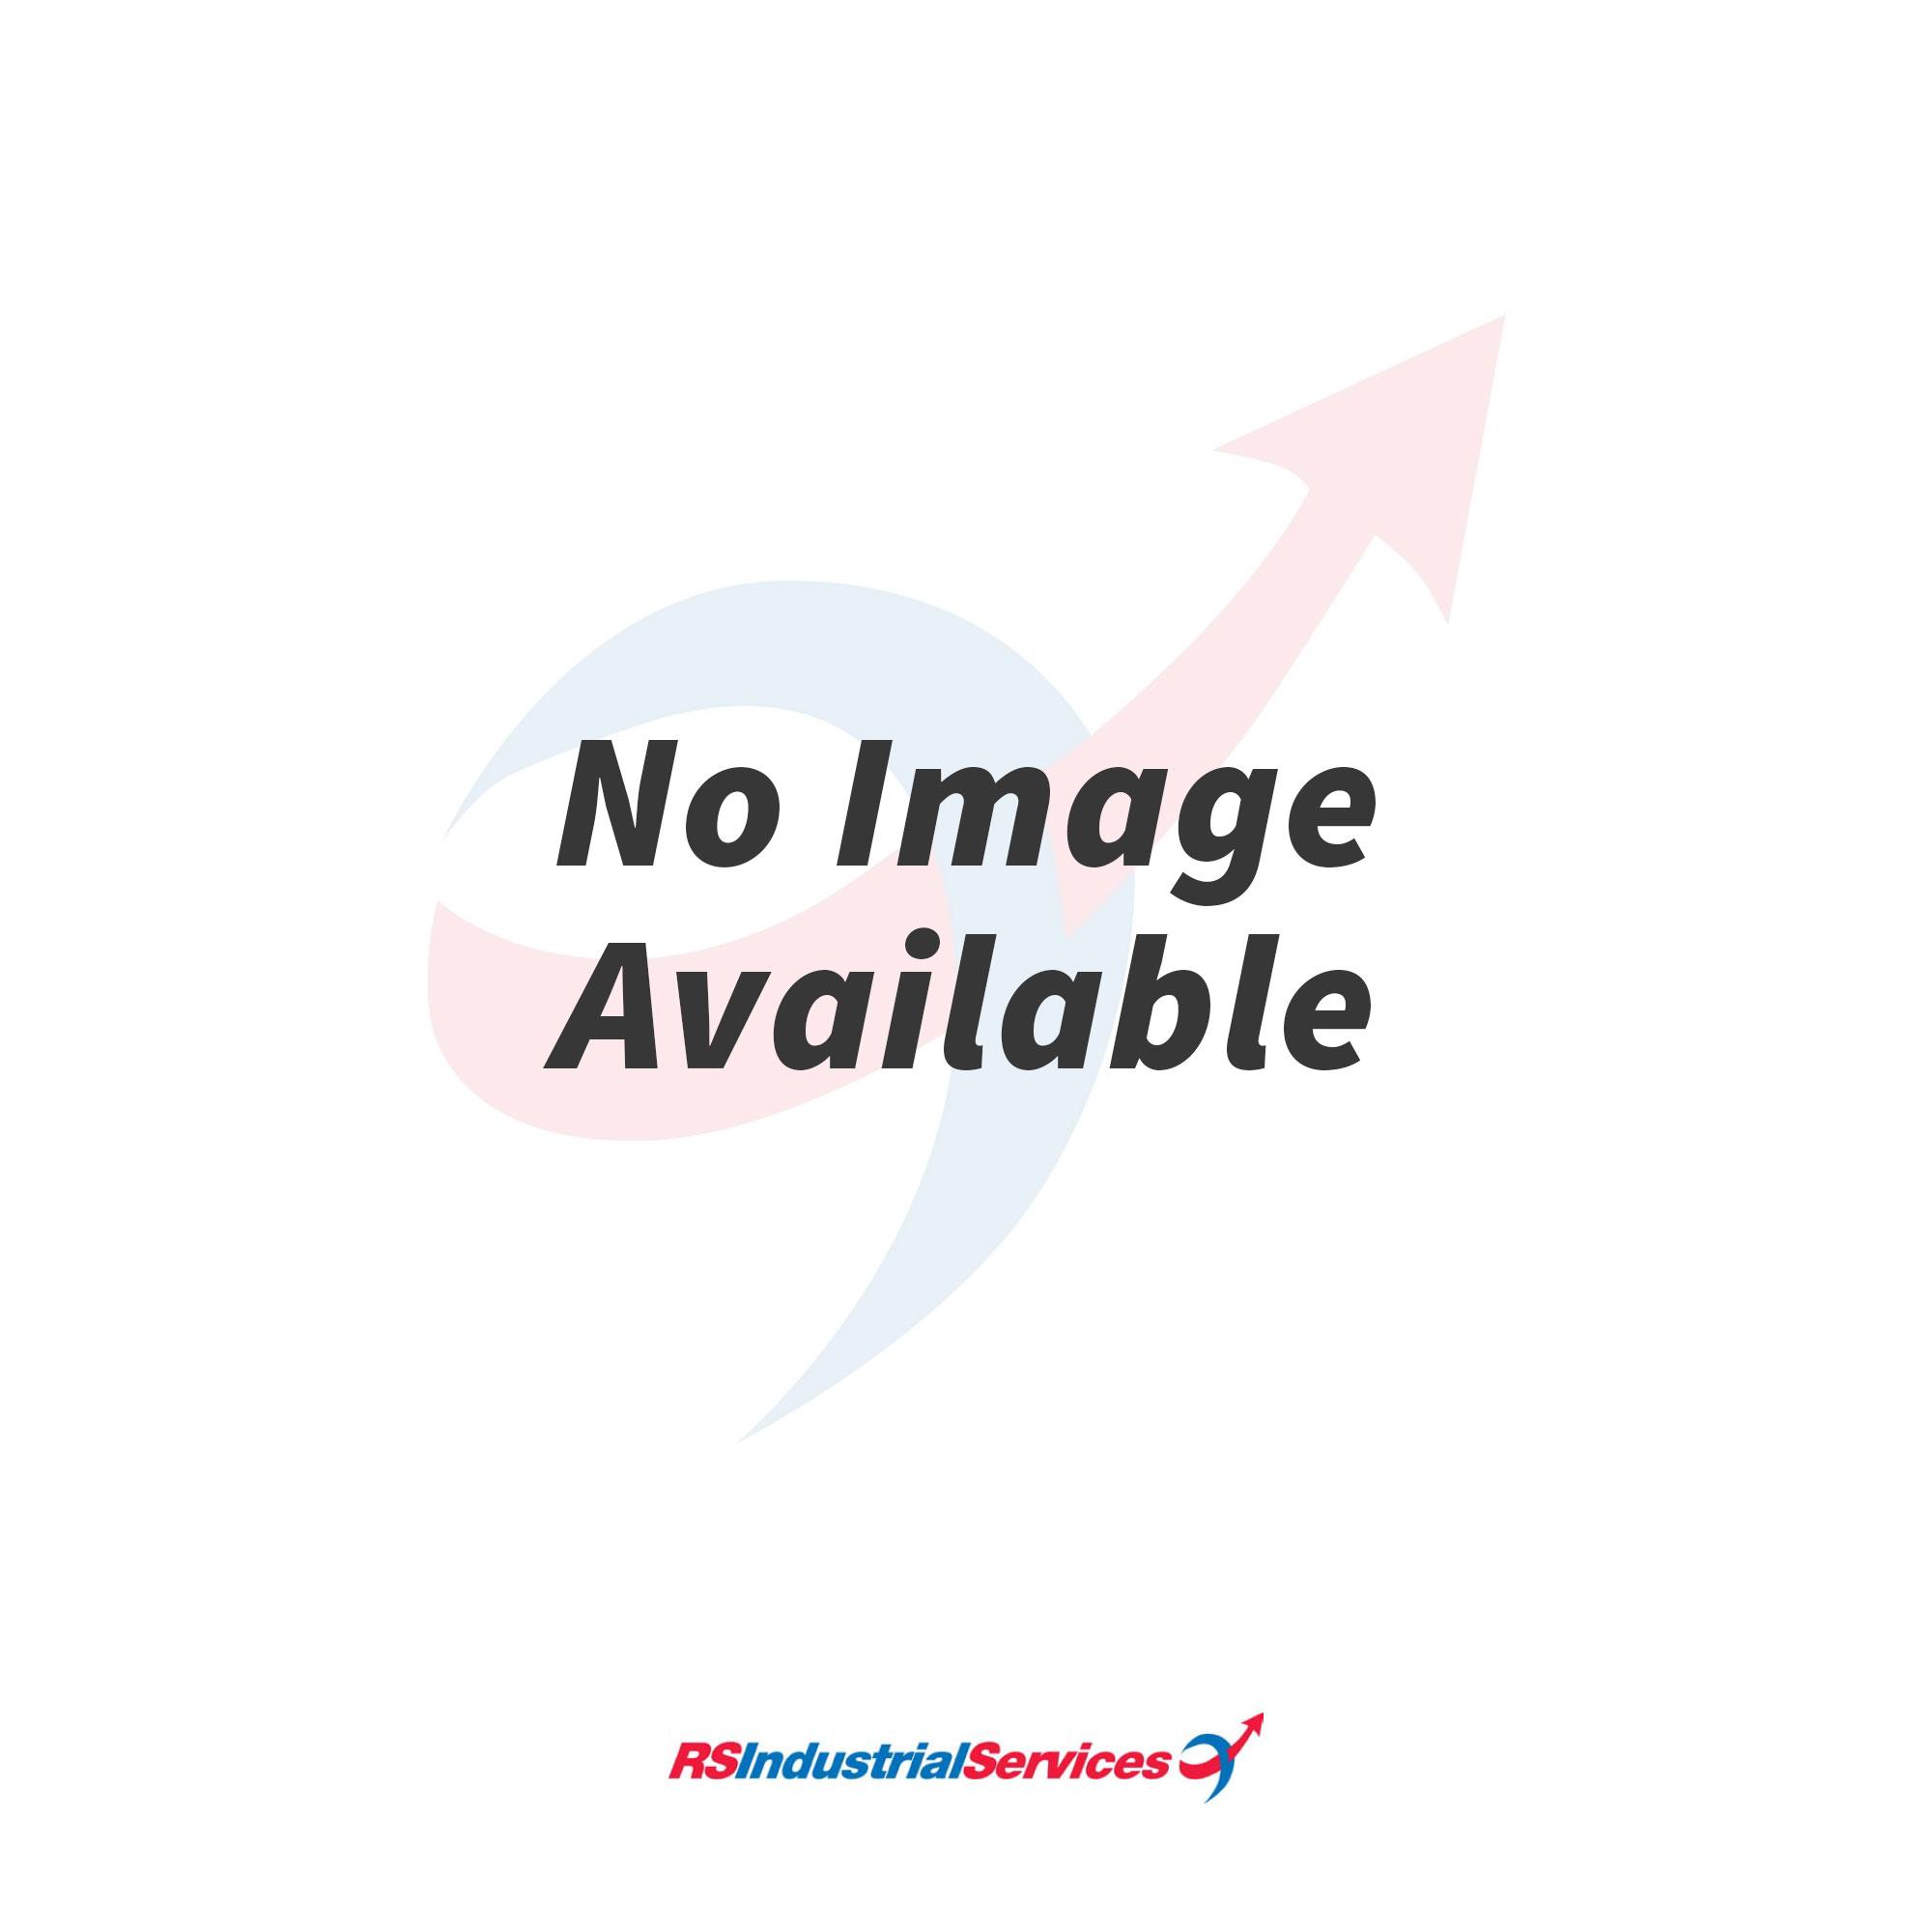 Xona Forged Jaw and Jaw Open Body Turnbuckle